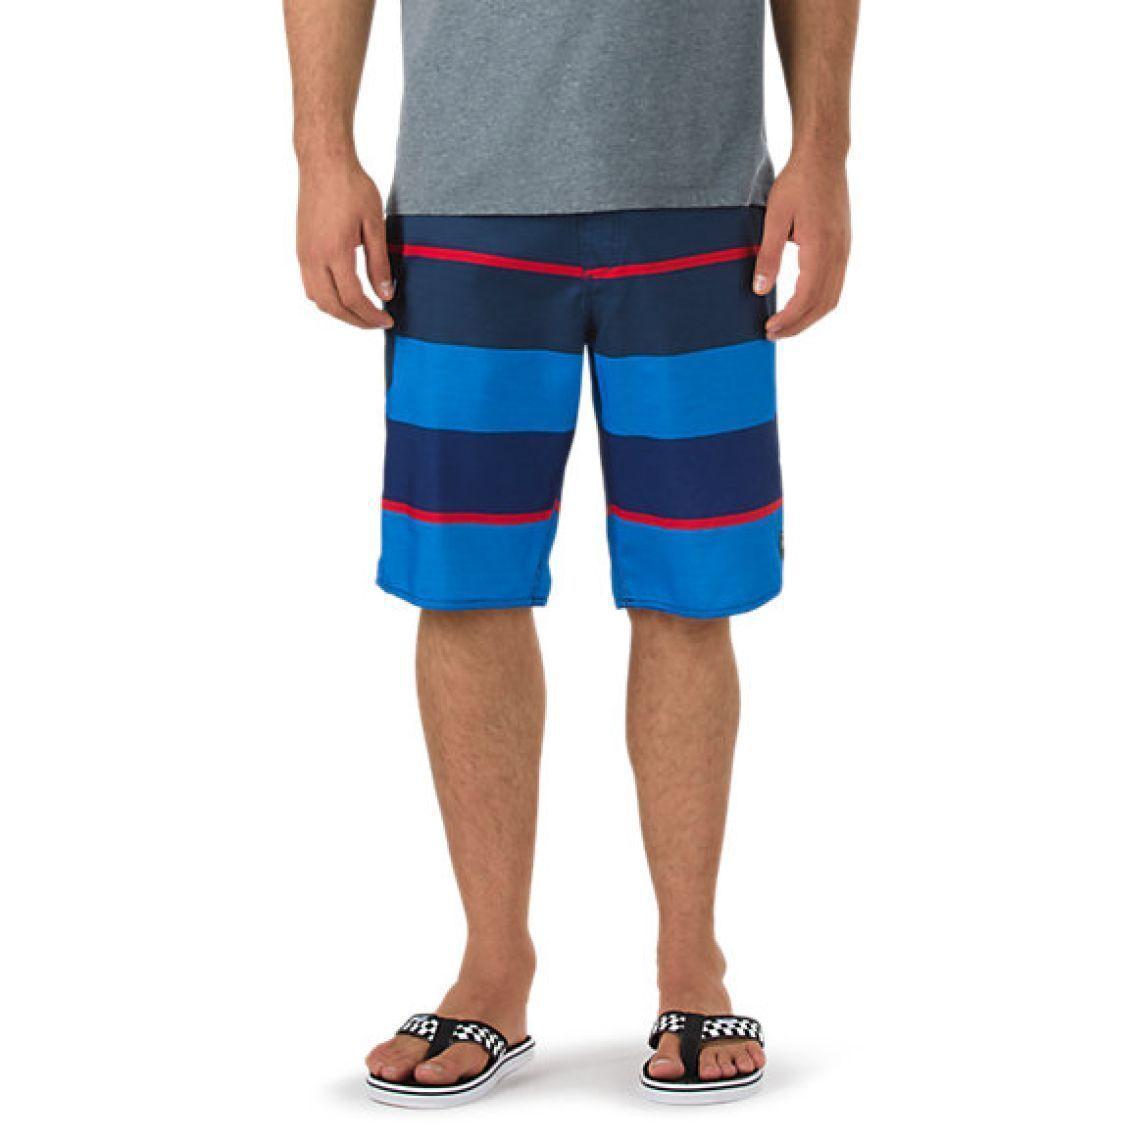 Vans Board Shorts 56th Street Shorts SZ 32 SWIM SUIT blueE Striped